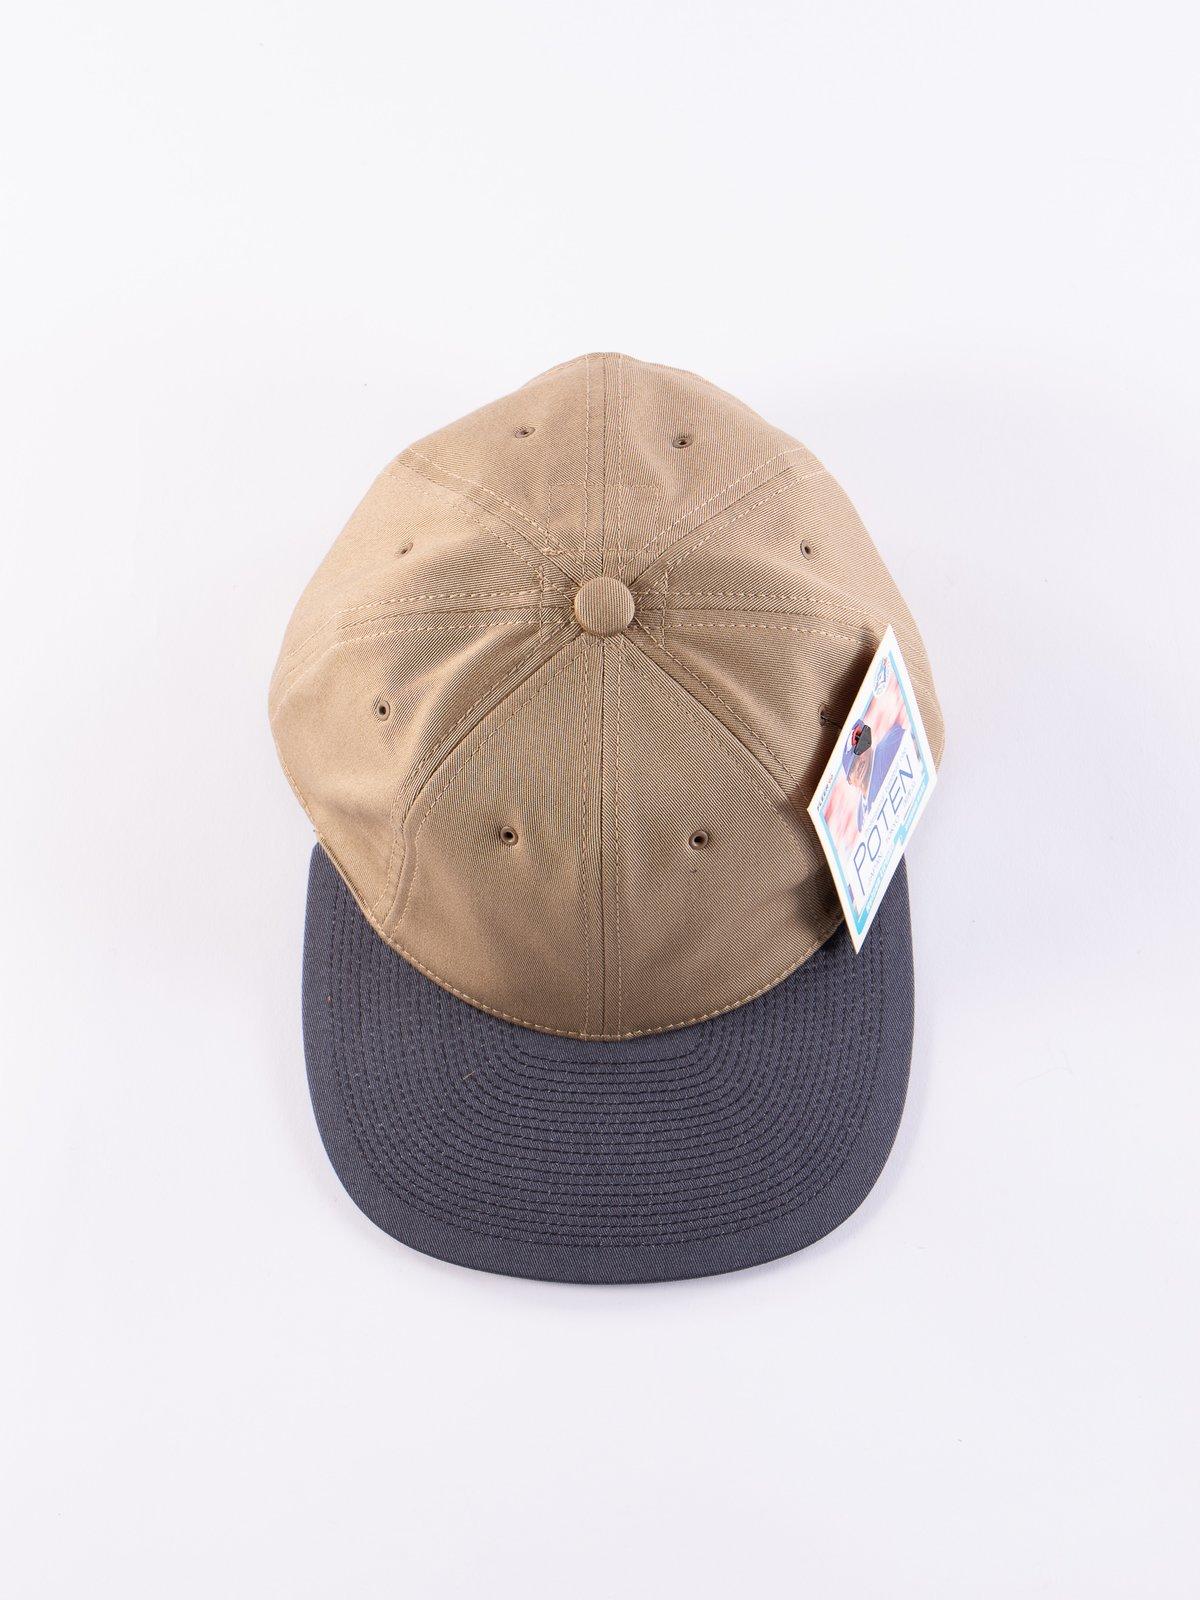 Beige/Black Chino Cap - Image 3